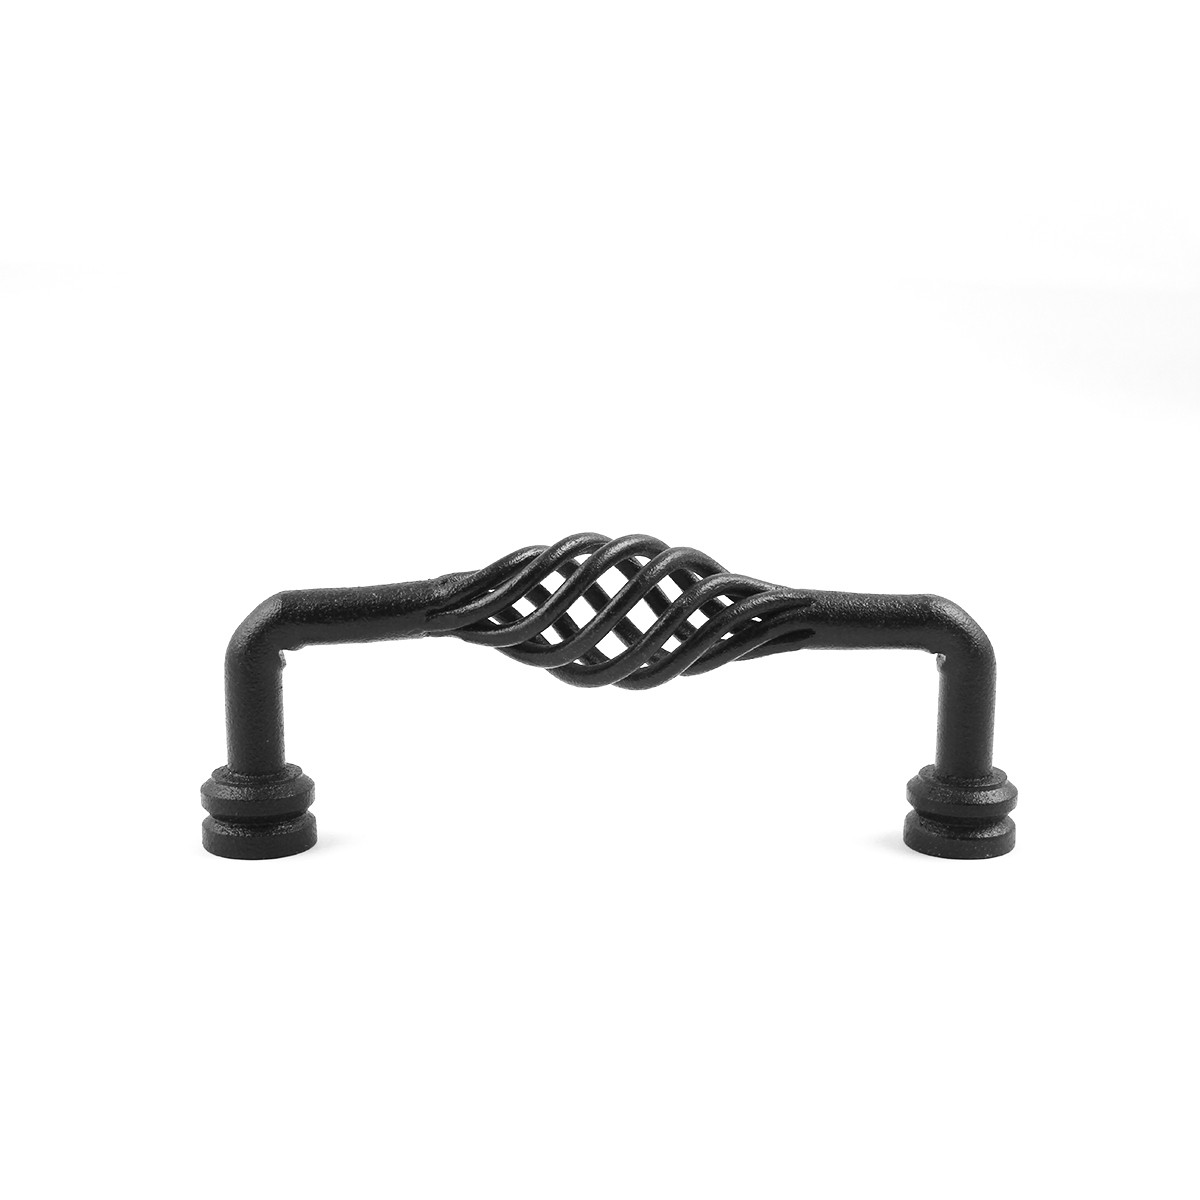 6 Black Wrought Iron Drawer Handle Cabinet Pull Birdcage Design Pack of 4 Furniture Hardware Cabinet Pull Cabinet Hardware